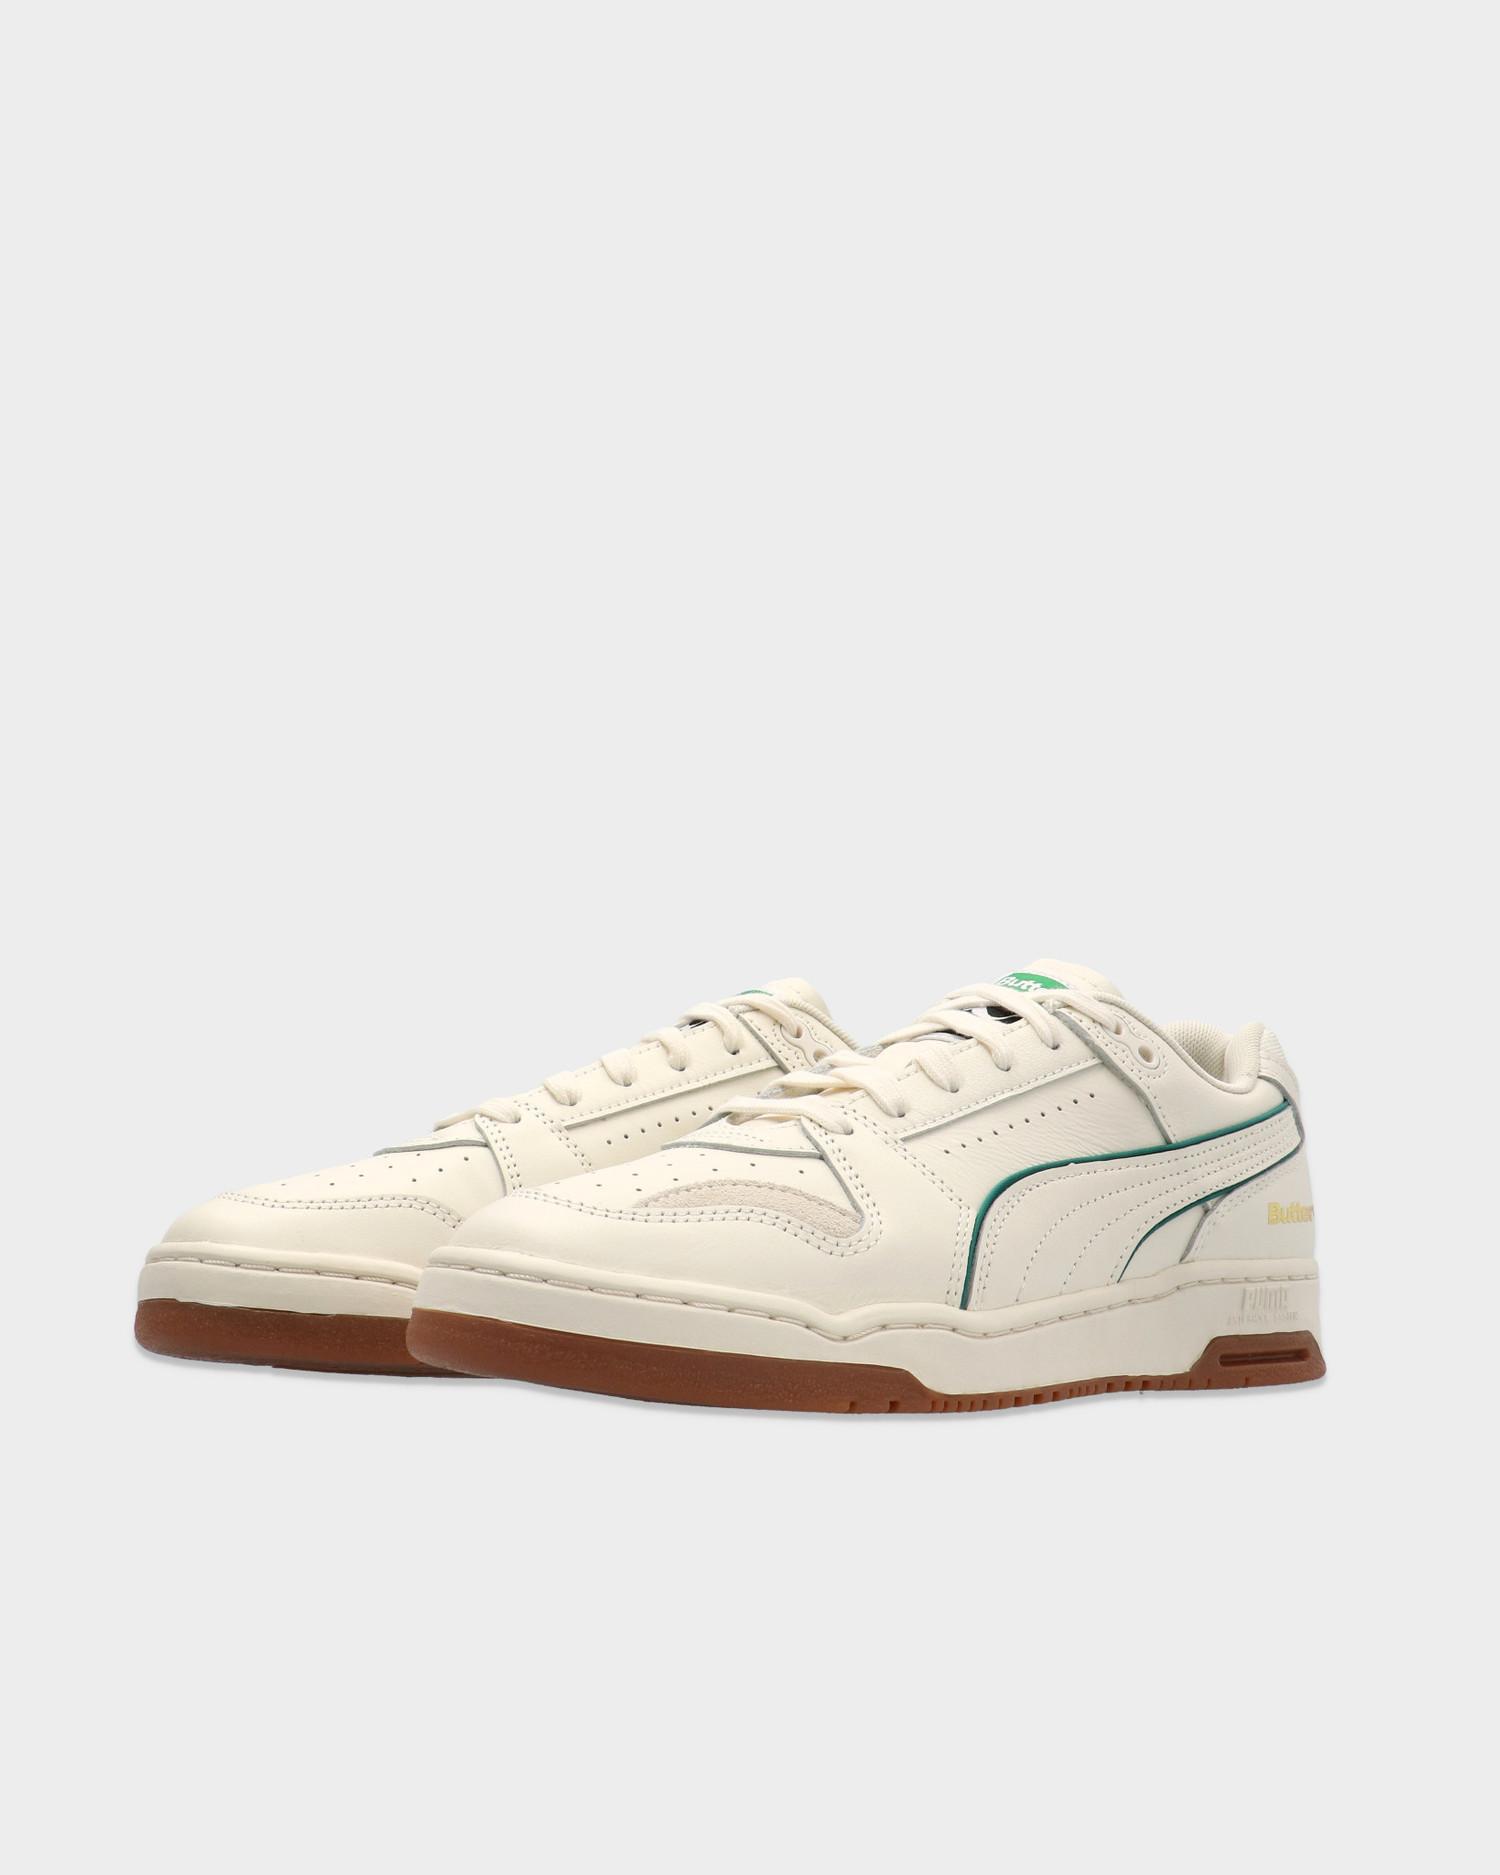 Puma Slipstream Lo x Butter Goods / Whisper White-Cadmium Green